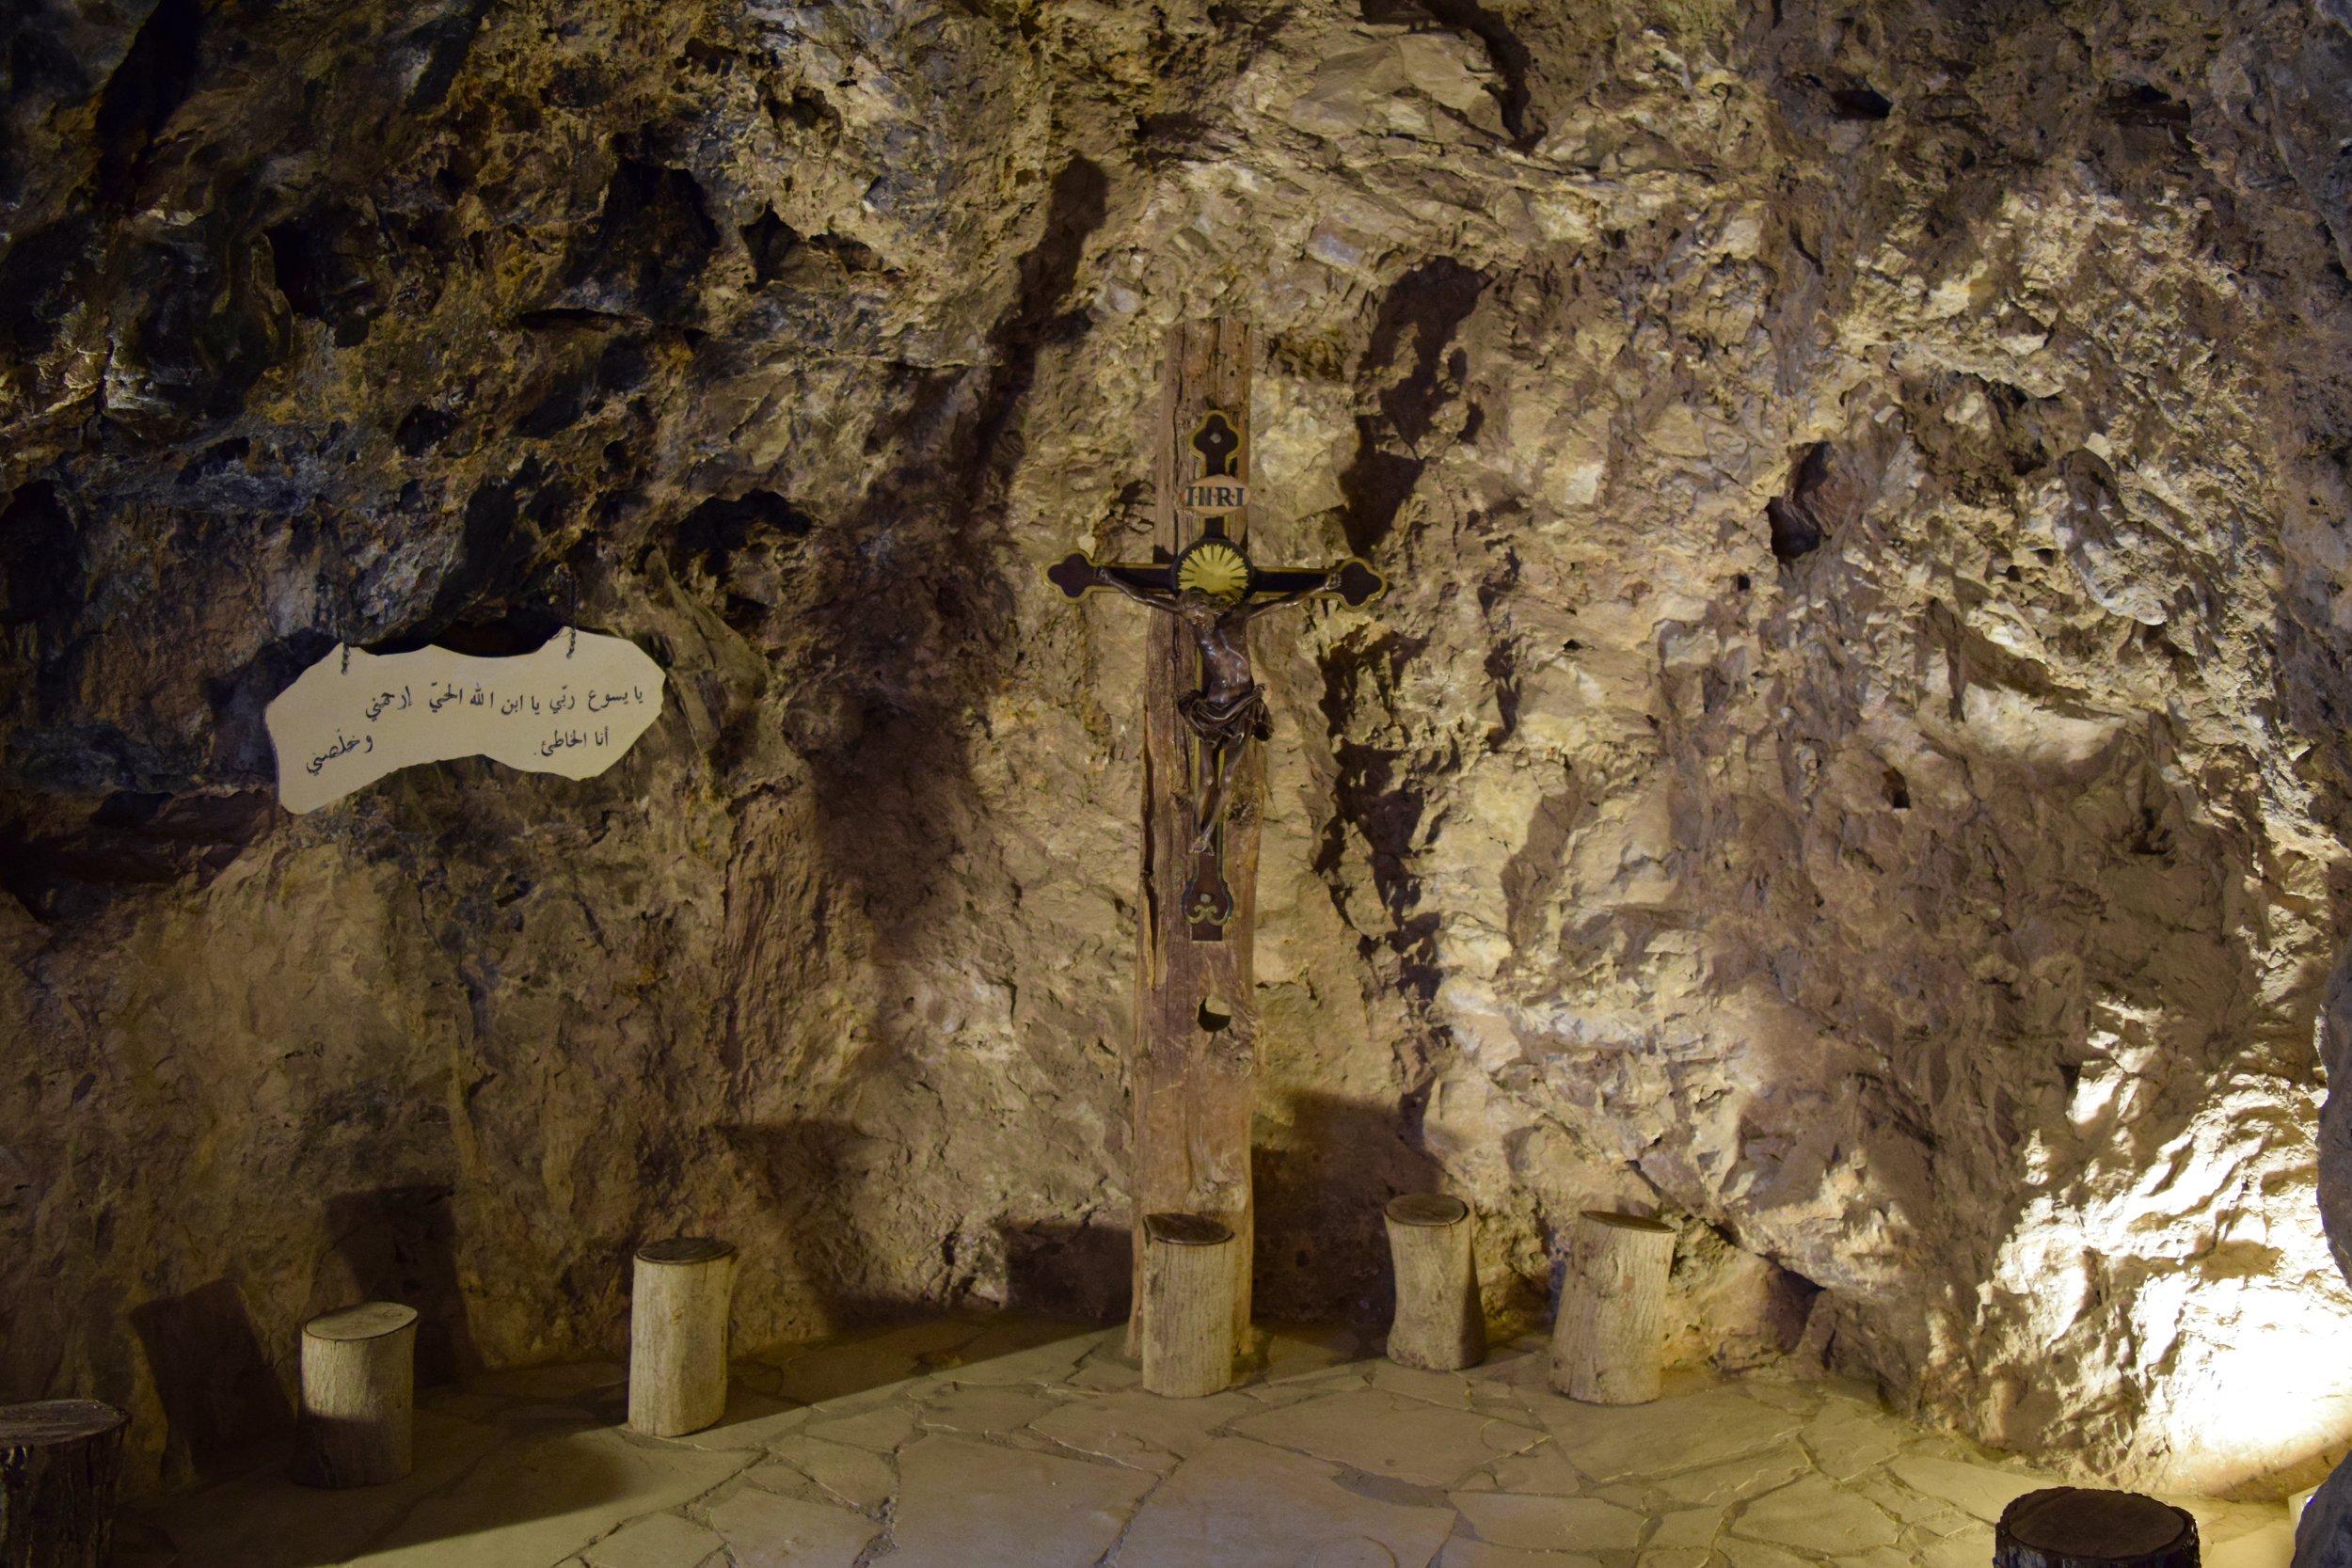 Interior of the Mar Lichaa Monastery